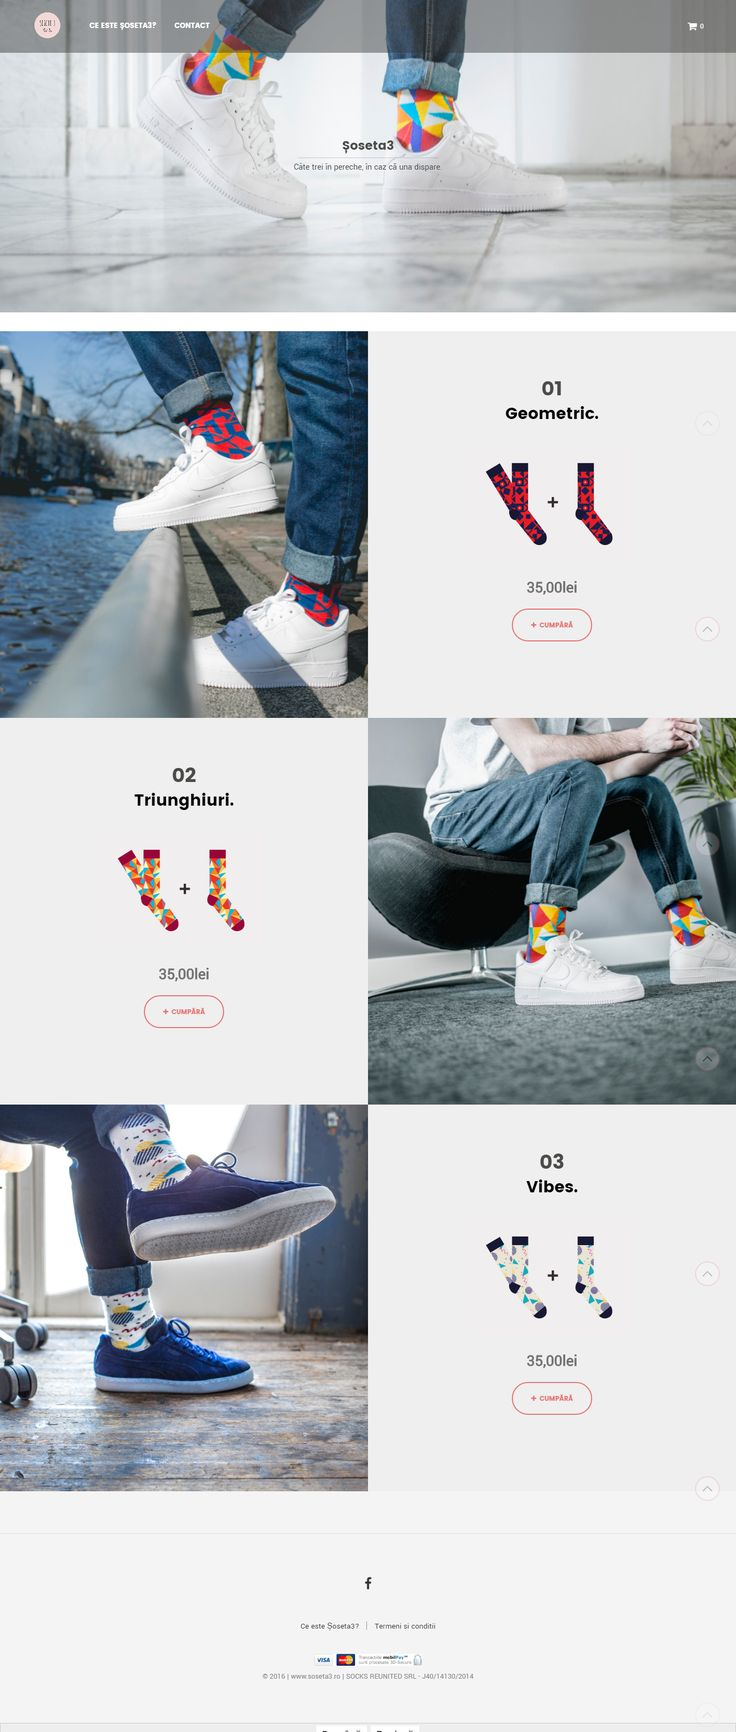 A funky socks shop created using Shopkeeper theme for WordPress http://themeforest.net/item/shopkeeper-responsive-wordpress-theme/9553045?&utm_source=pinterest.com&utm_medium=social&utm_content=soseta&utm_campaign=showcase #onlineshop #ecommerce #socks #clothing #webdesign #UX